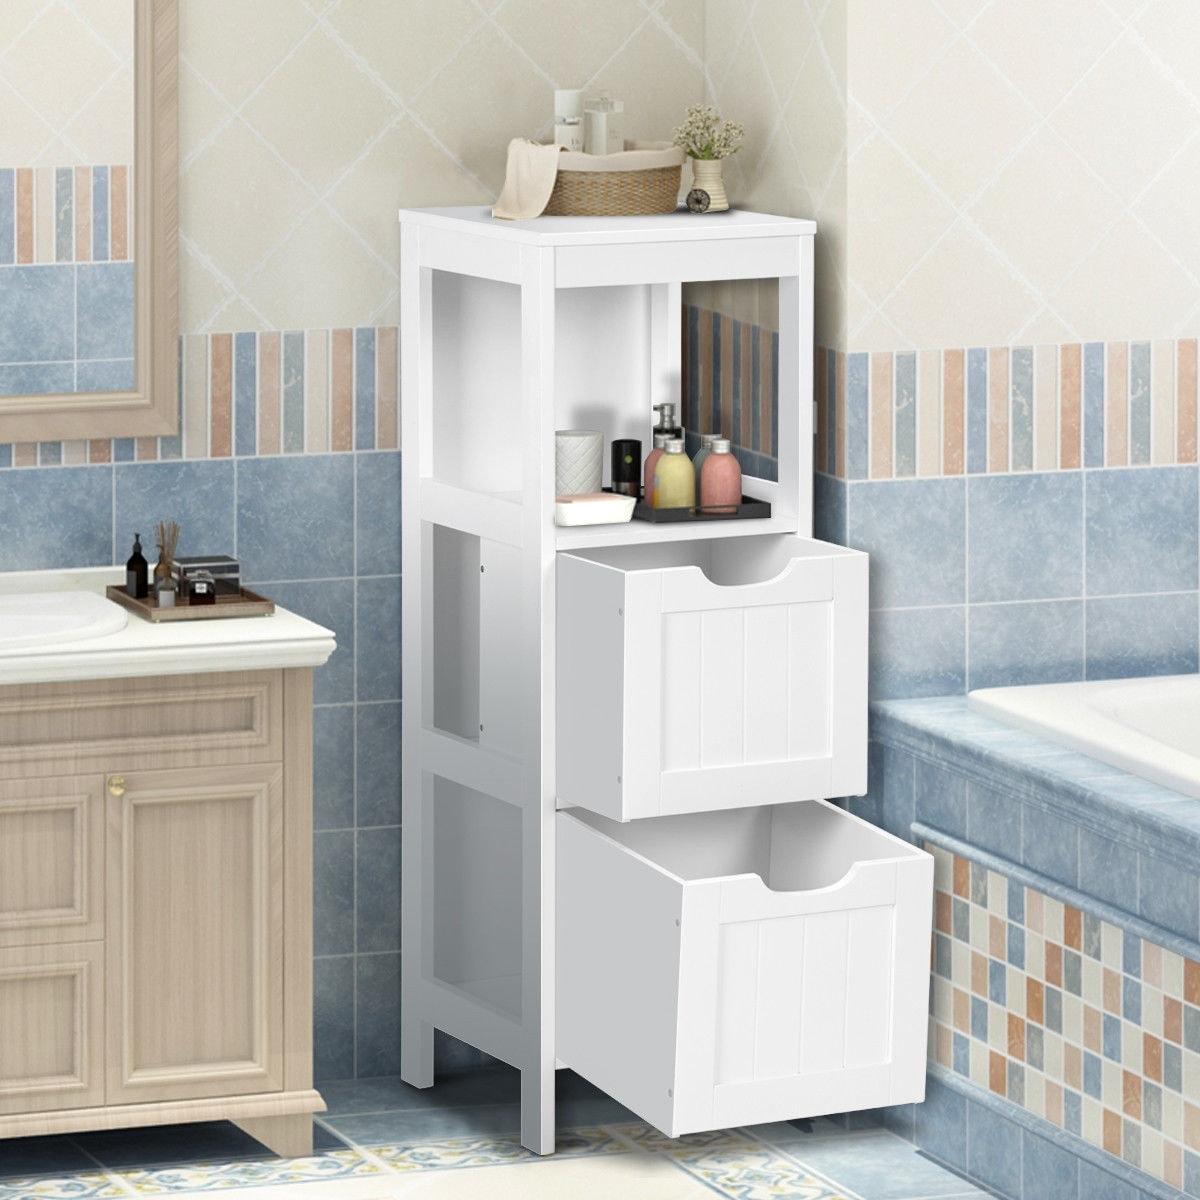 Shop Gymax Bathroom Floor Cabinet Multifunctional Bathroom Storage ...